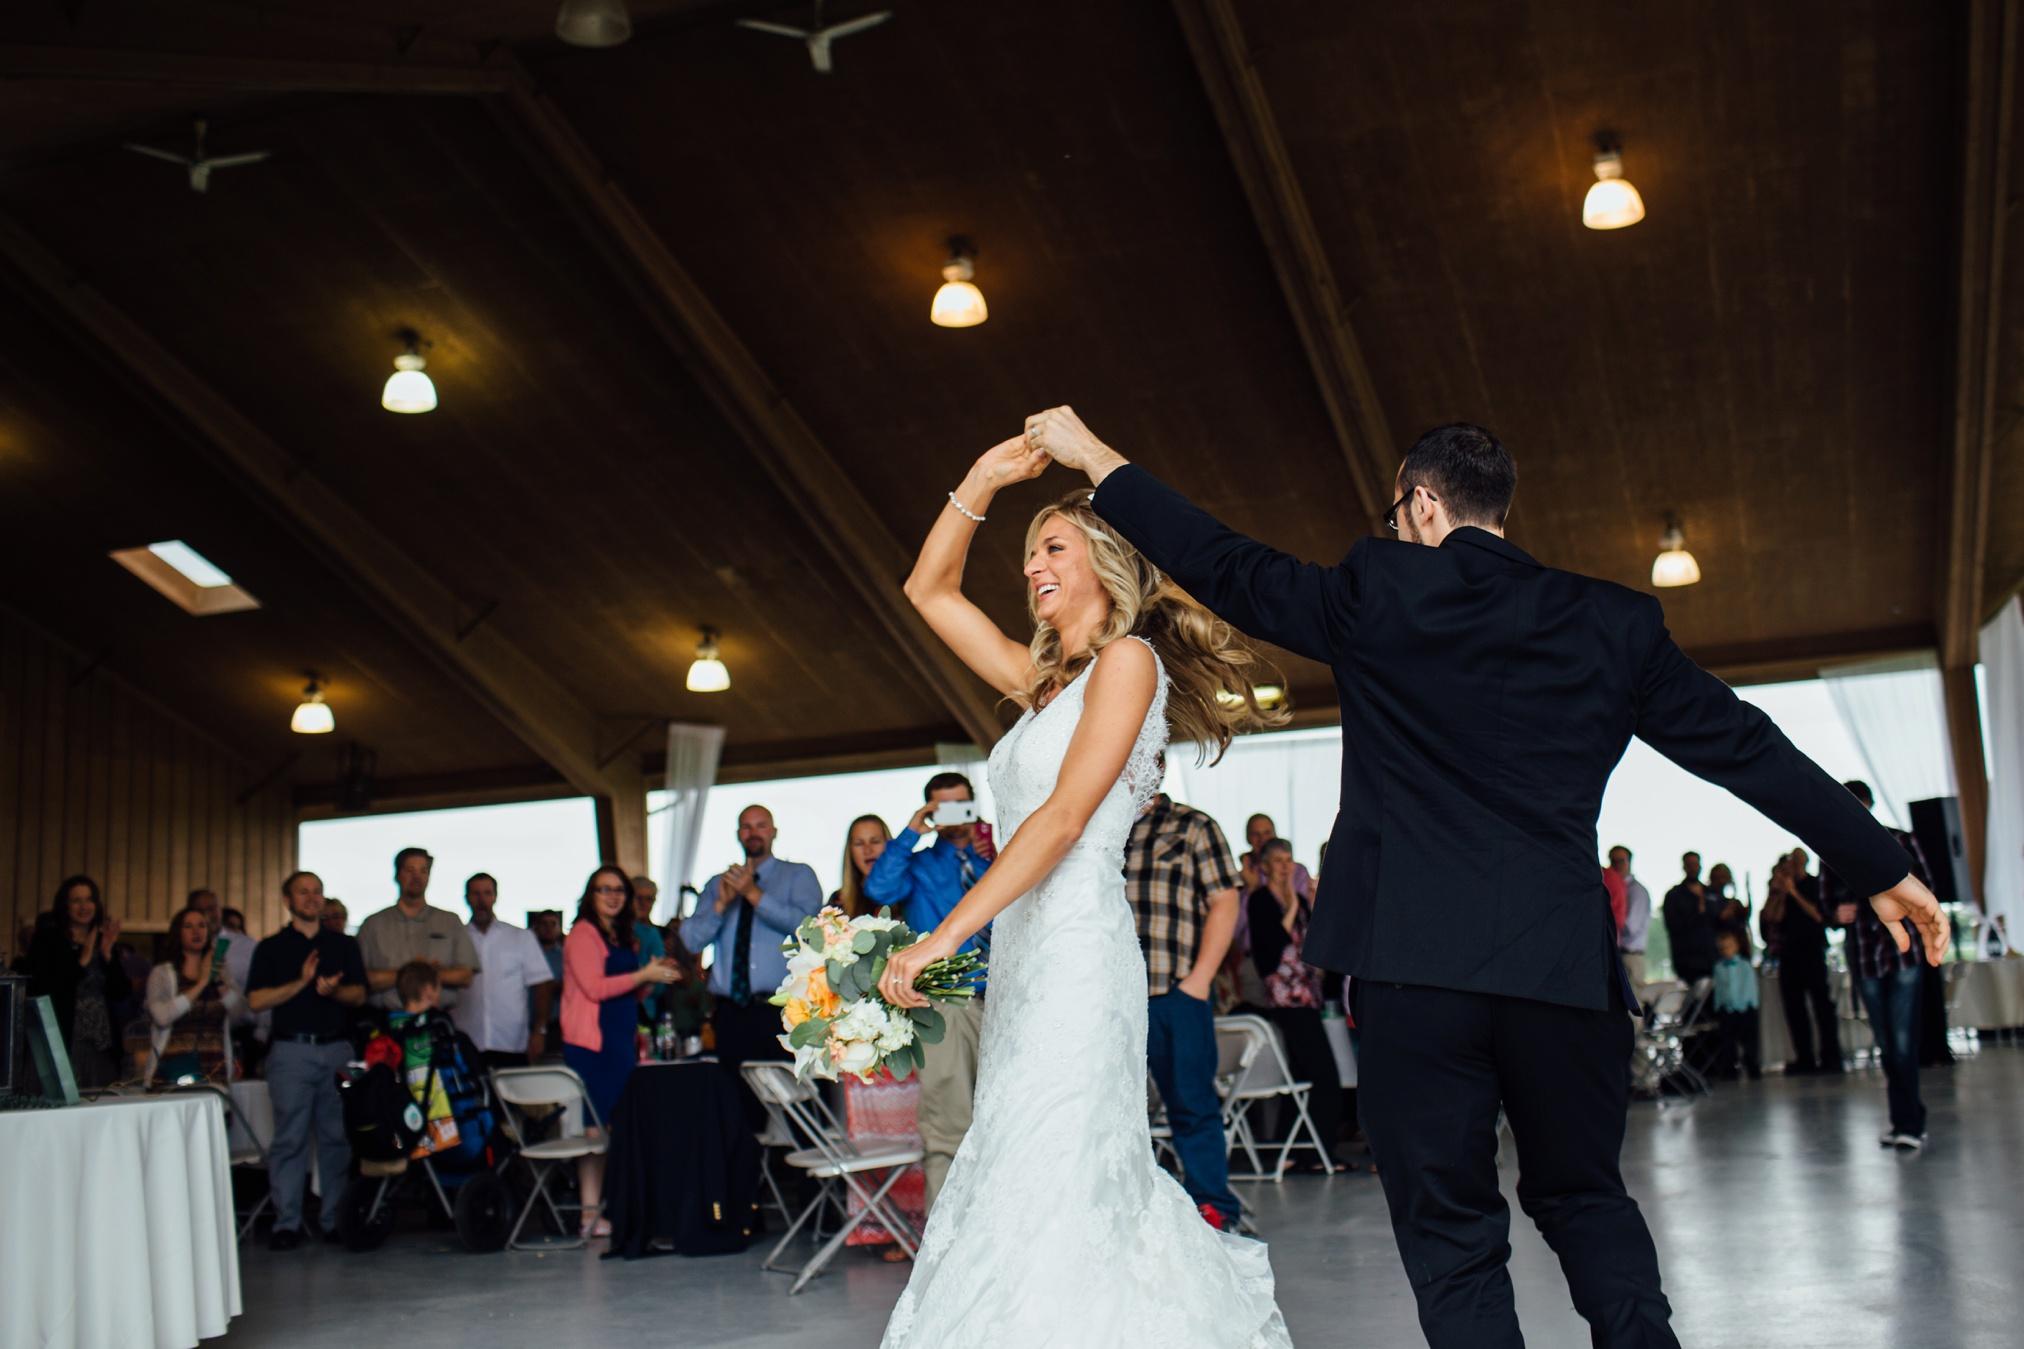 schmid_wedding-688.jpg